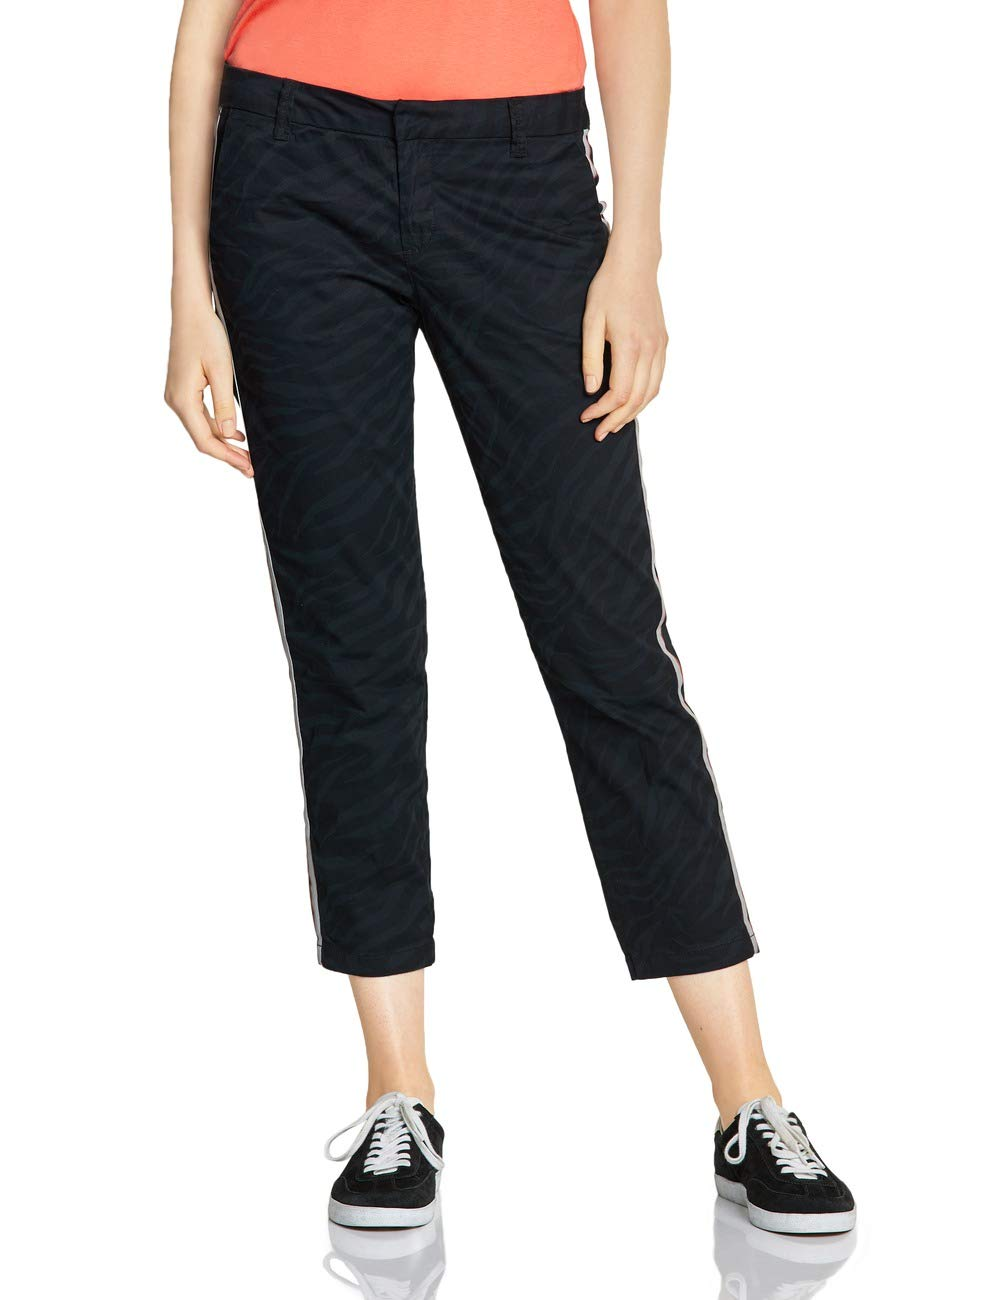 PantalonMulticoloreneo One Casual Fit Grey 21017W44 l26taille Fabricant44Femme 372422 Chino Street PiuTXkOZ